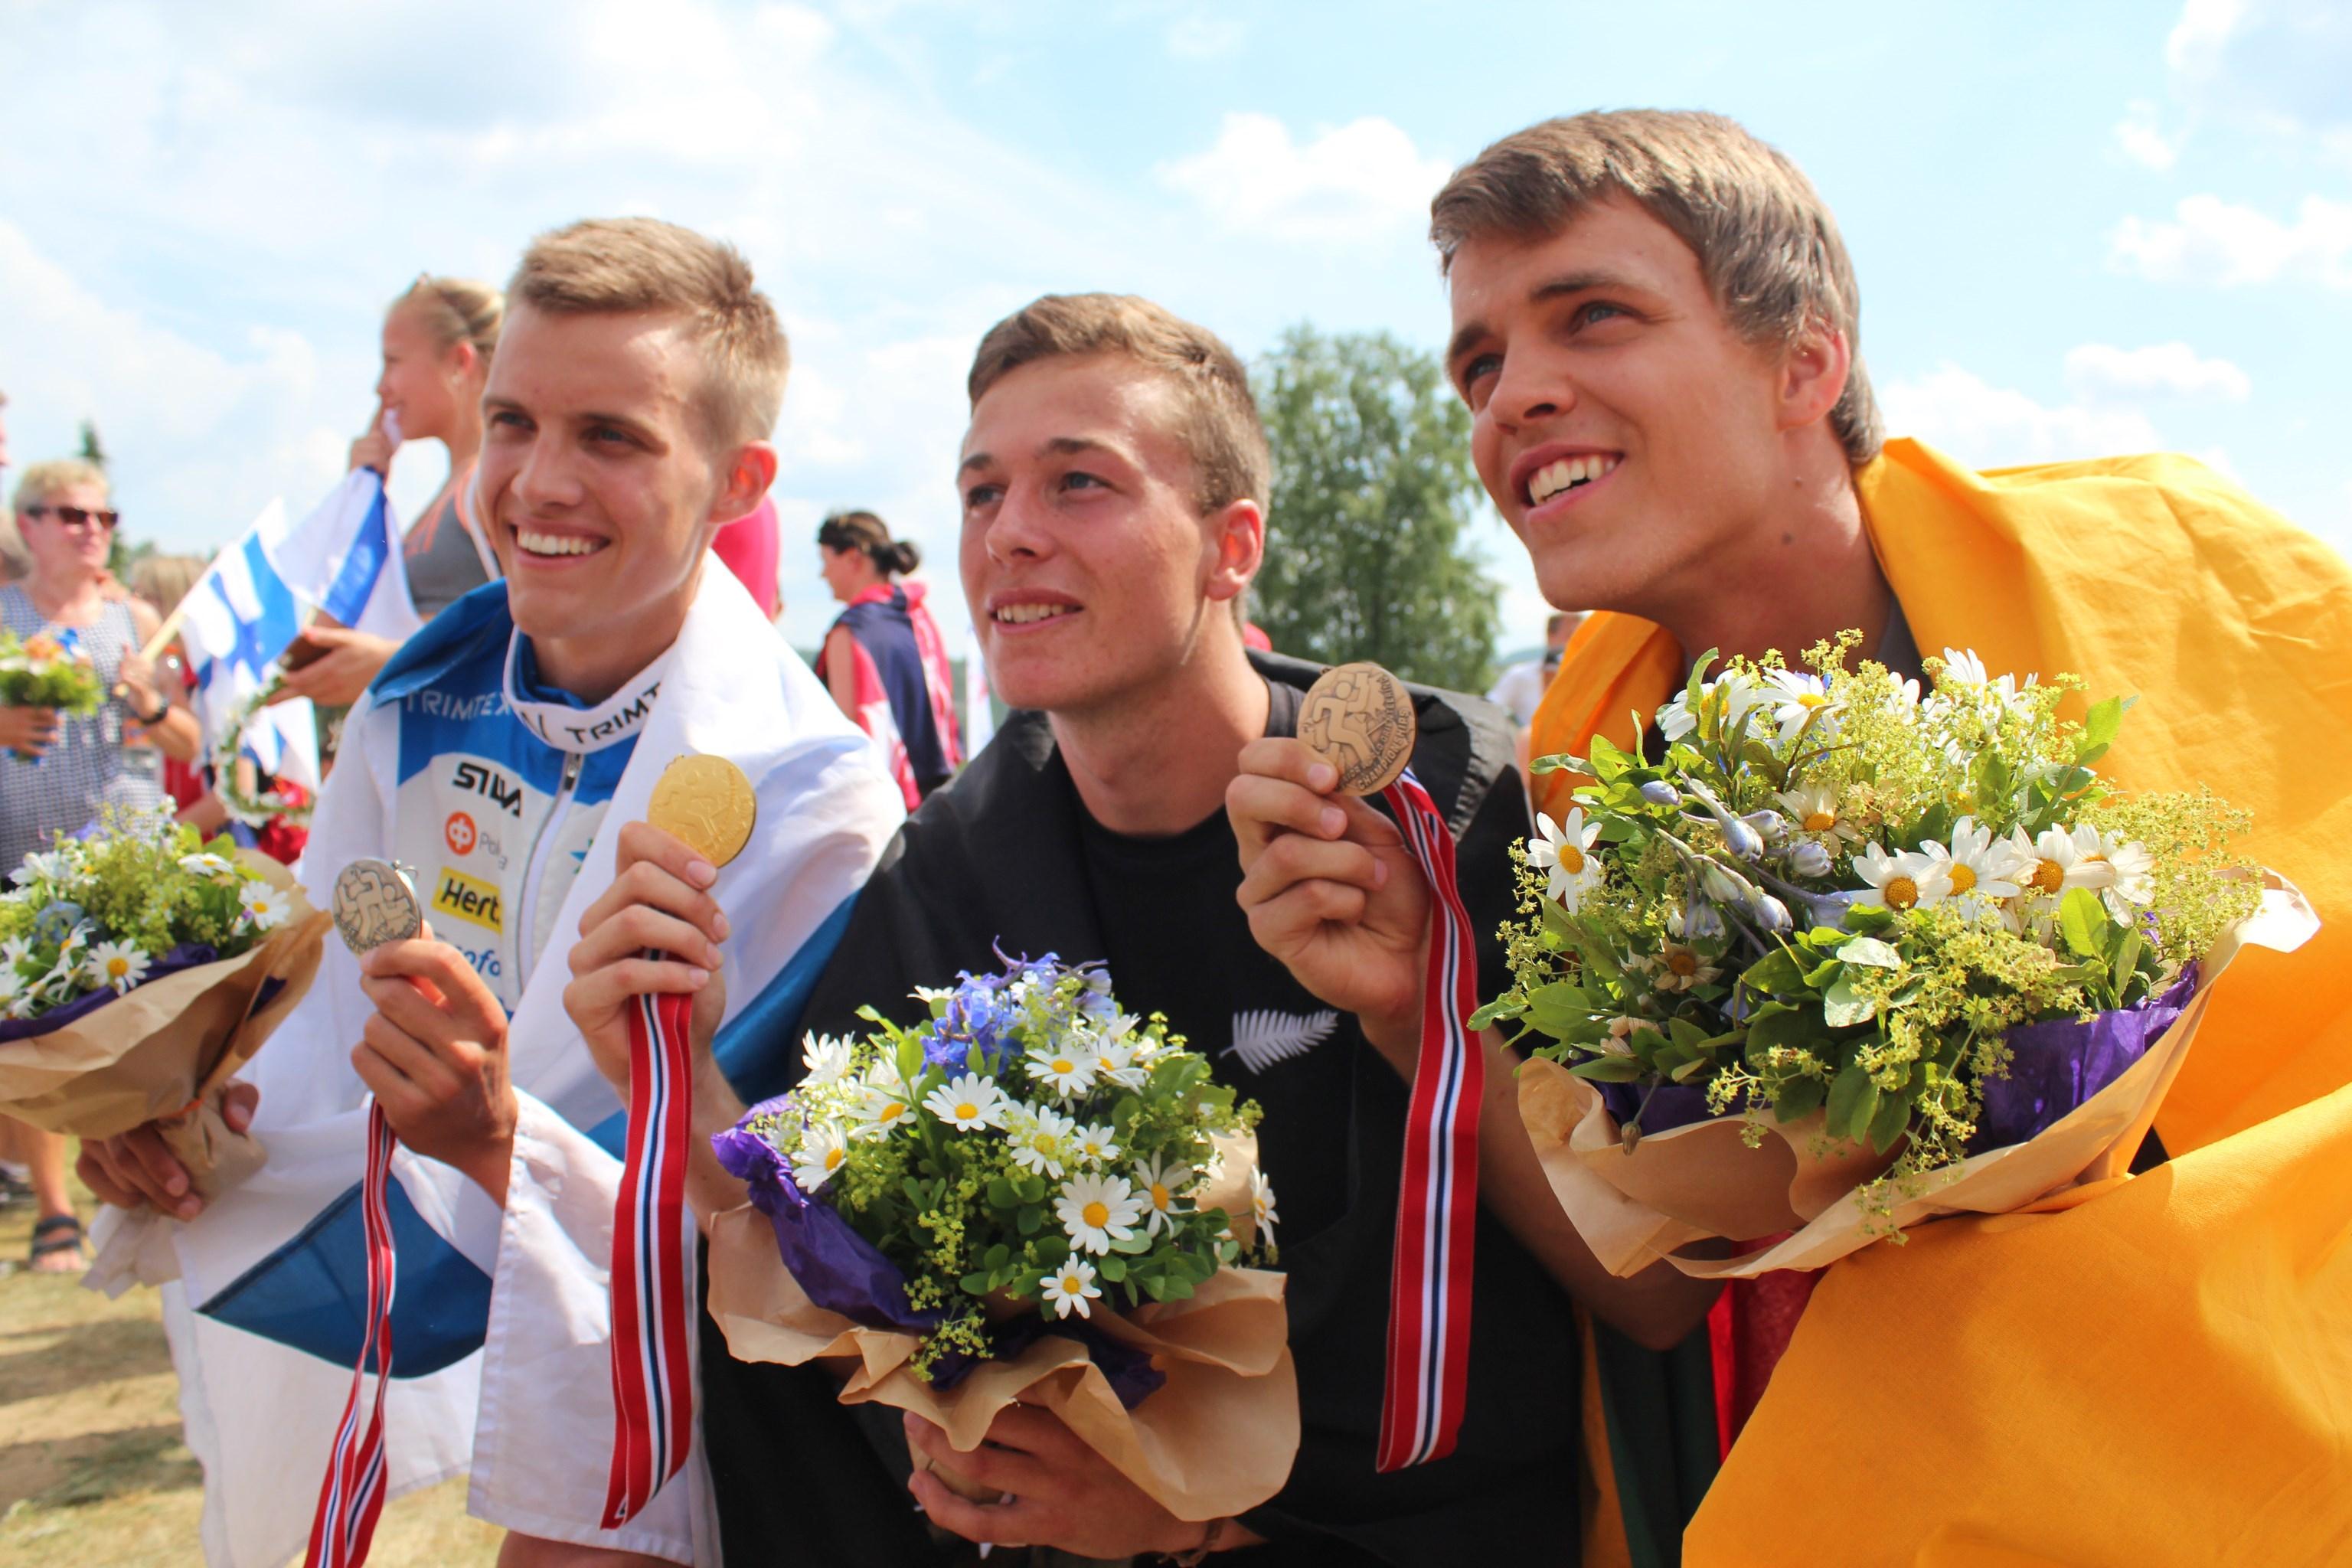 JWOC Sprint Medal Holders